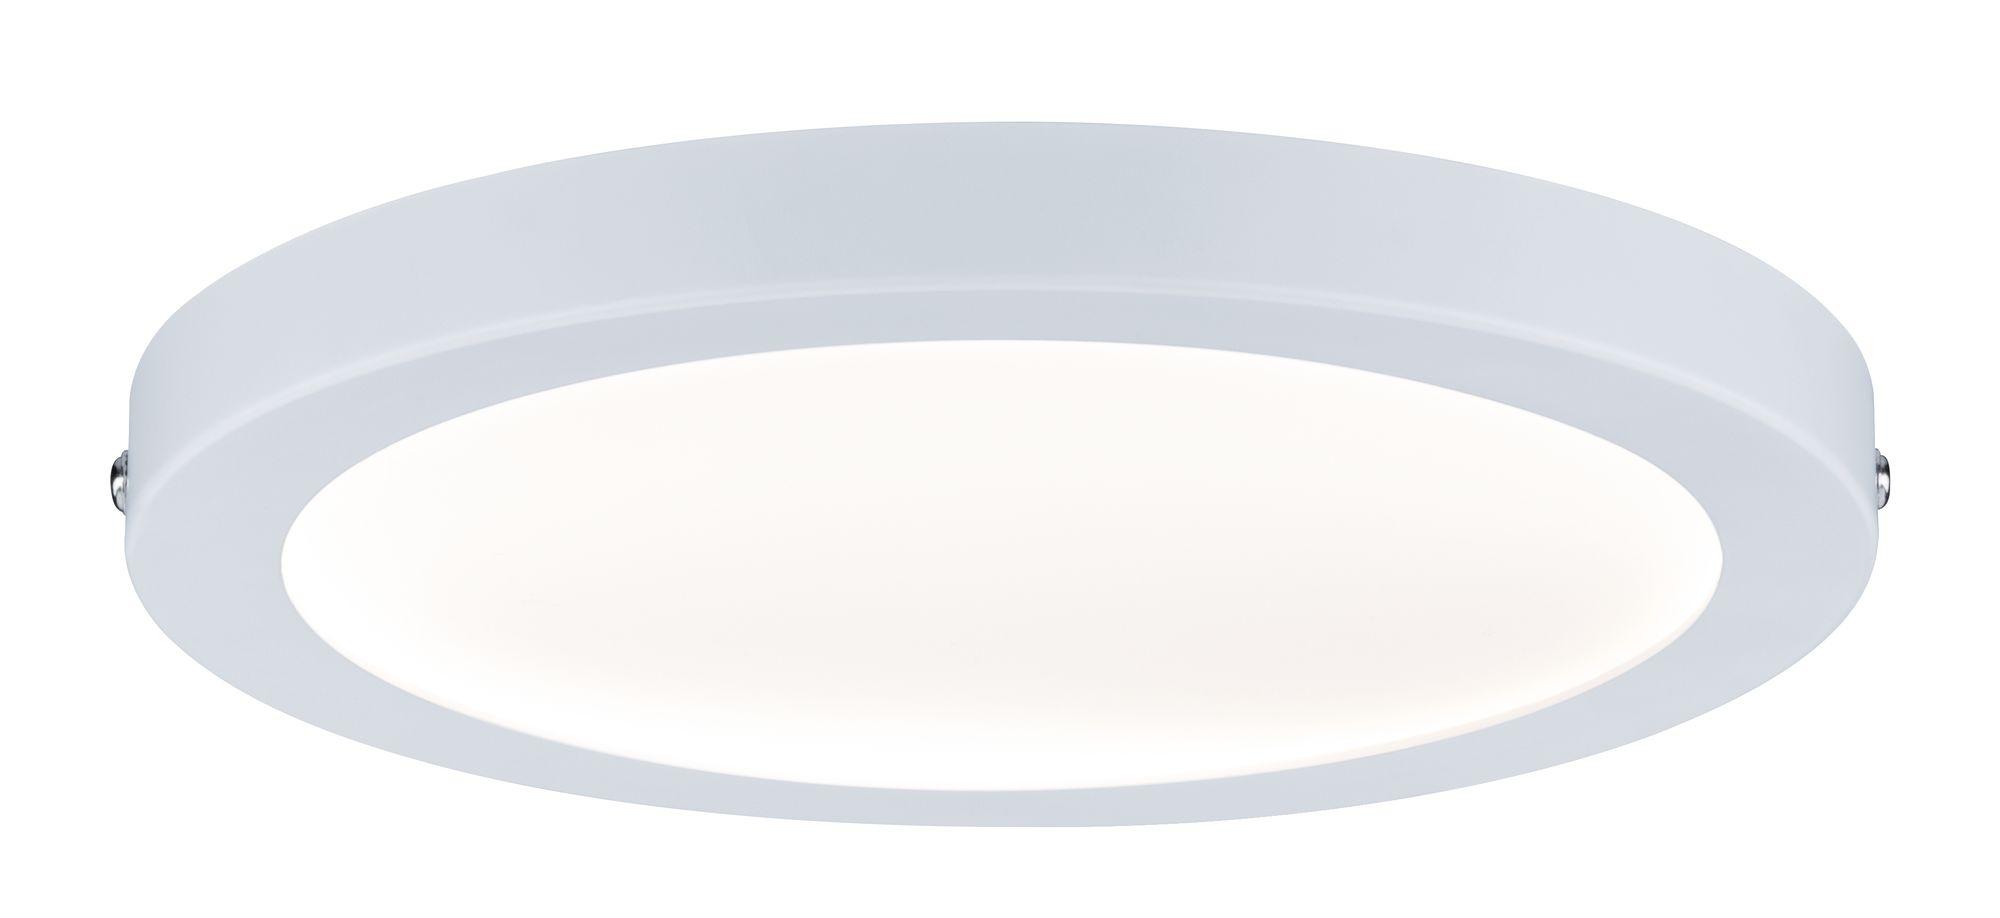 wand deckenleuchte atria led panel rund 18 5w wei matt dimmbar 70868. Black Bedroom Furniture Sets. Home Design Ideas